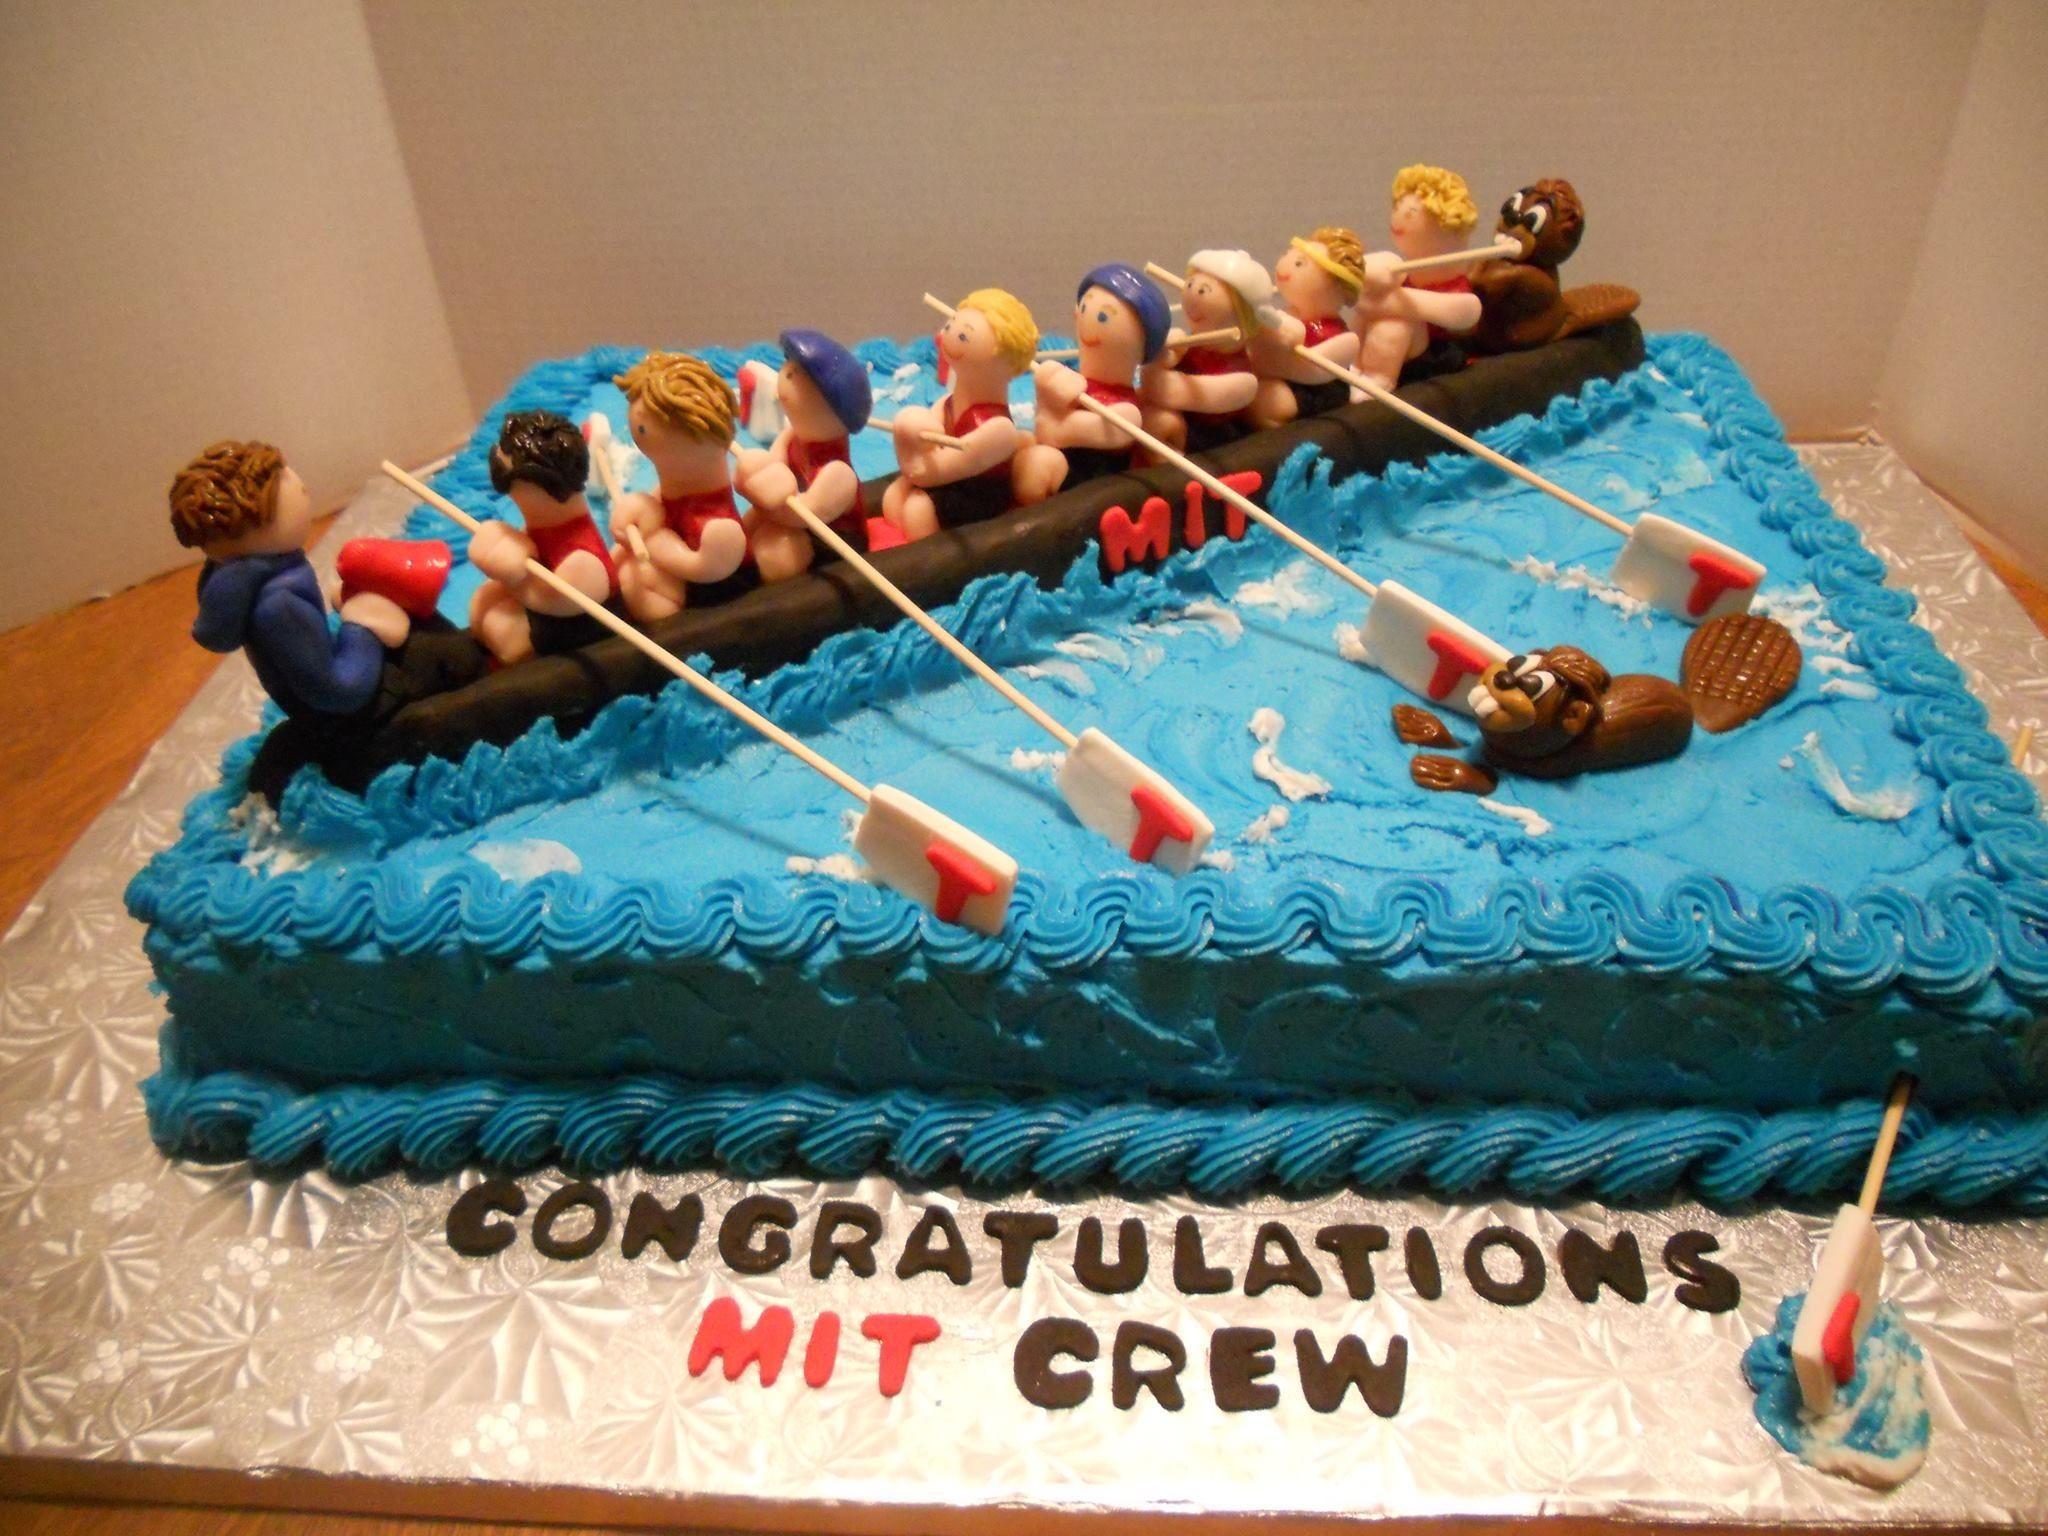 Mit Crew Cake W Row Row Your Boat